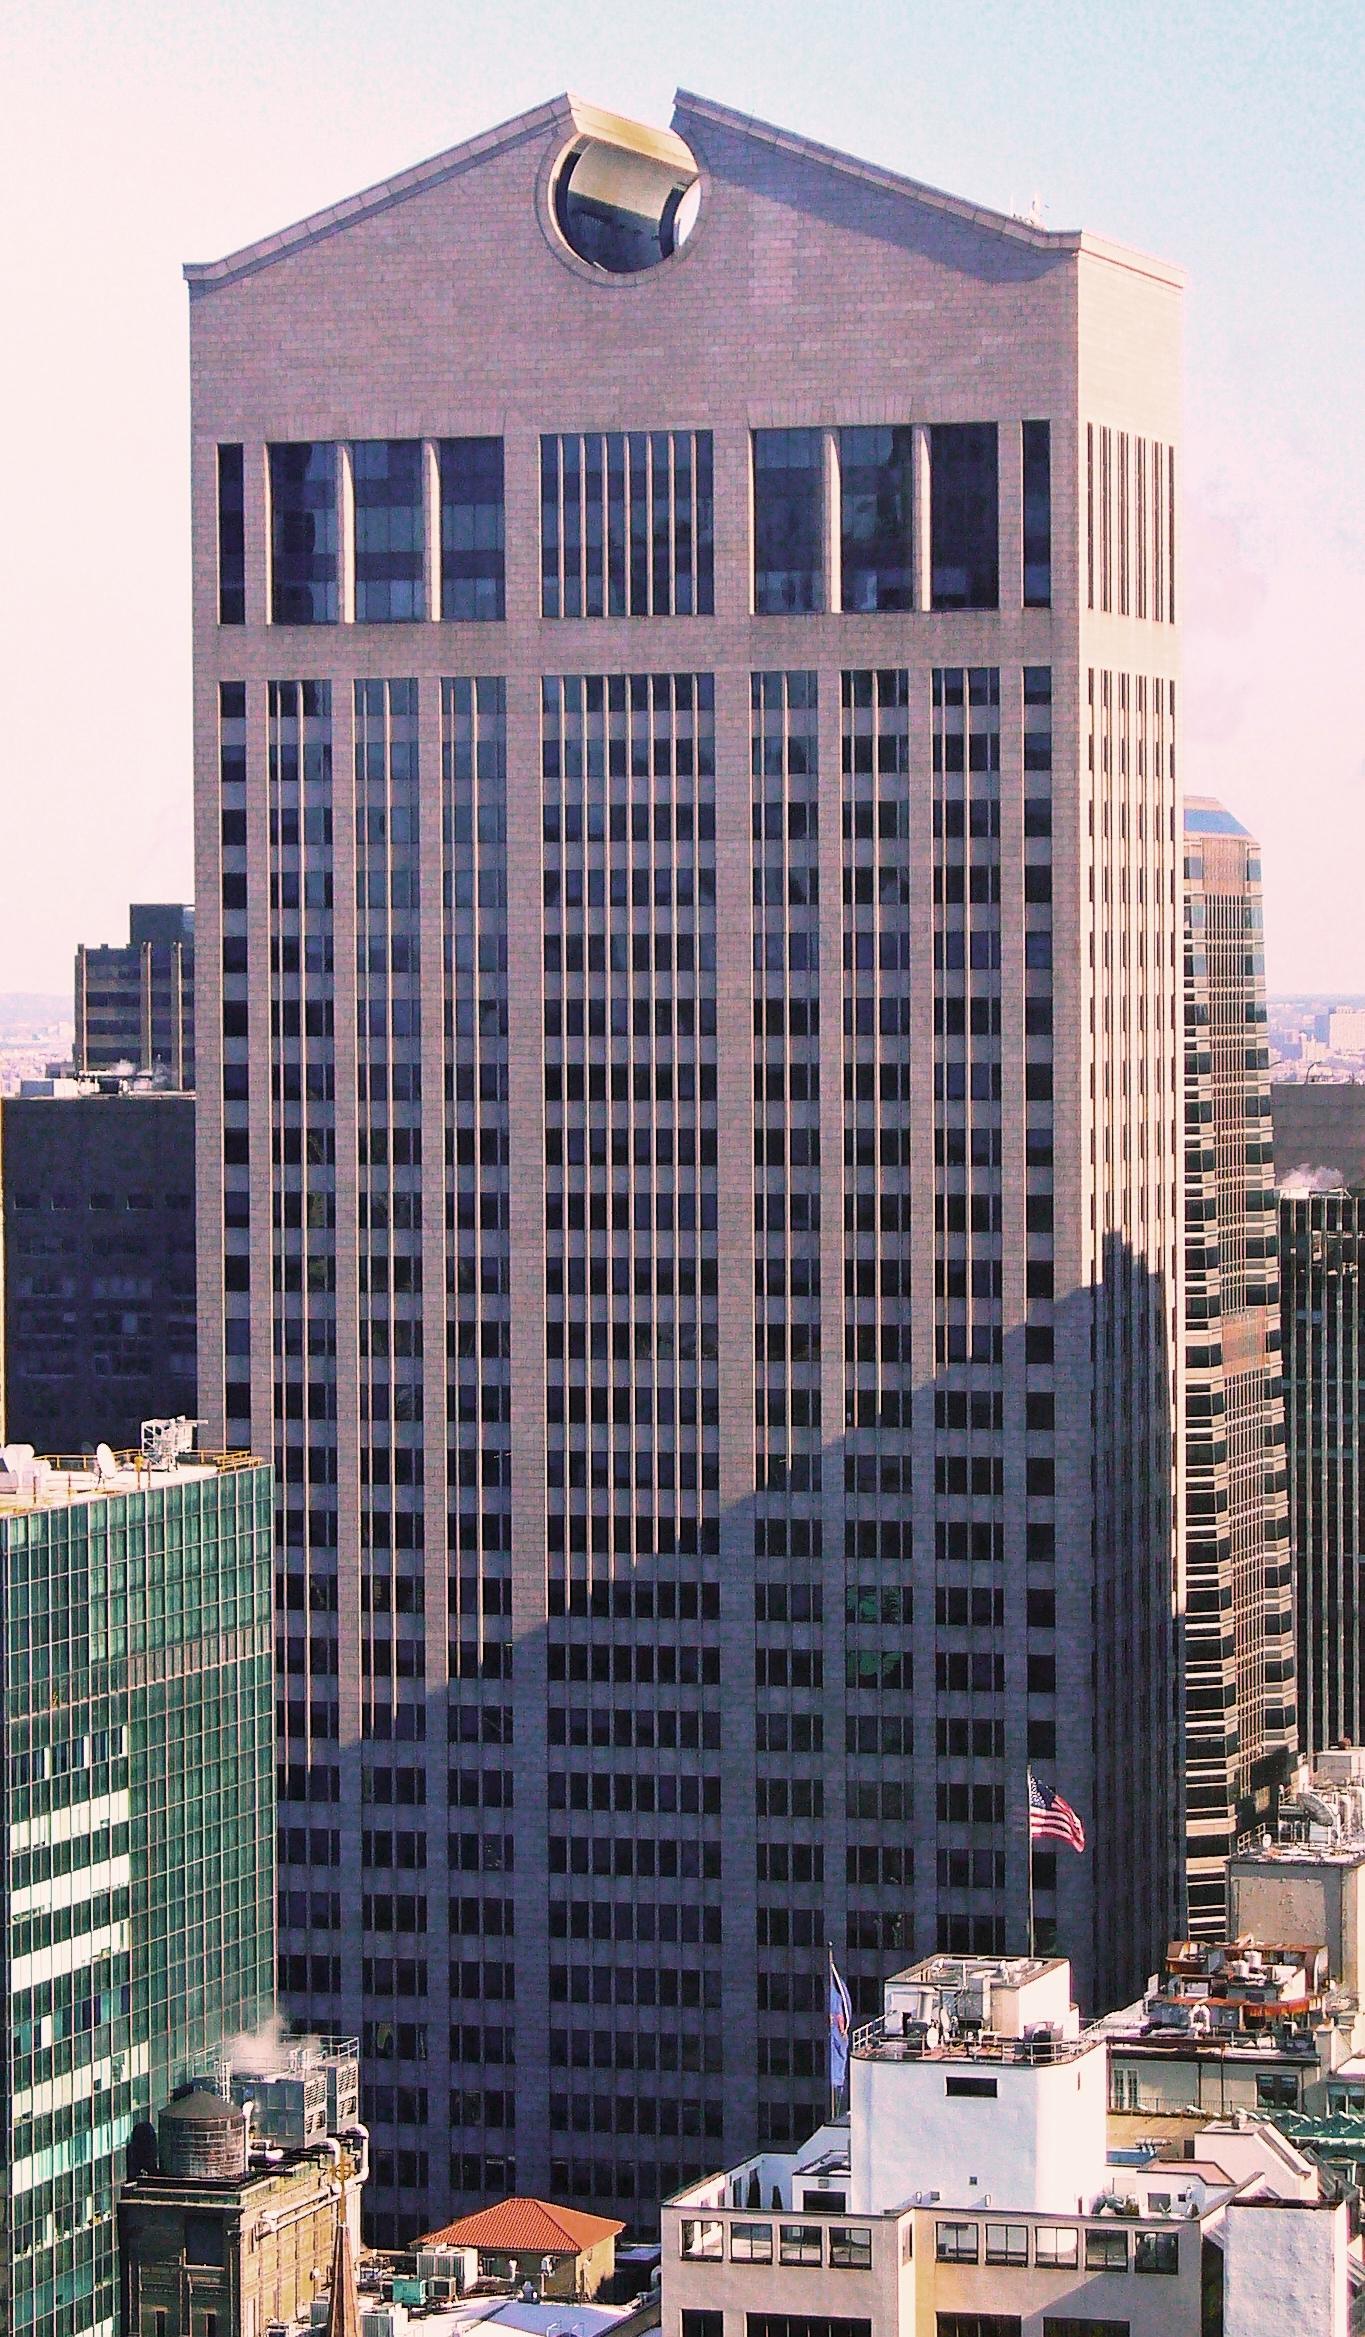 550 Madison Avenue - Wikipedia